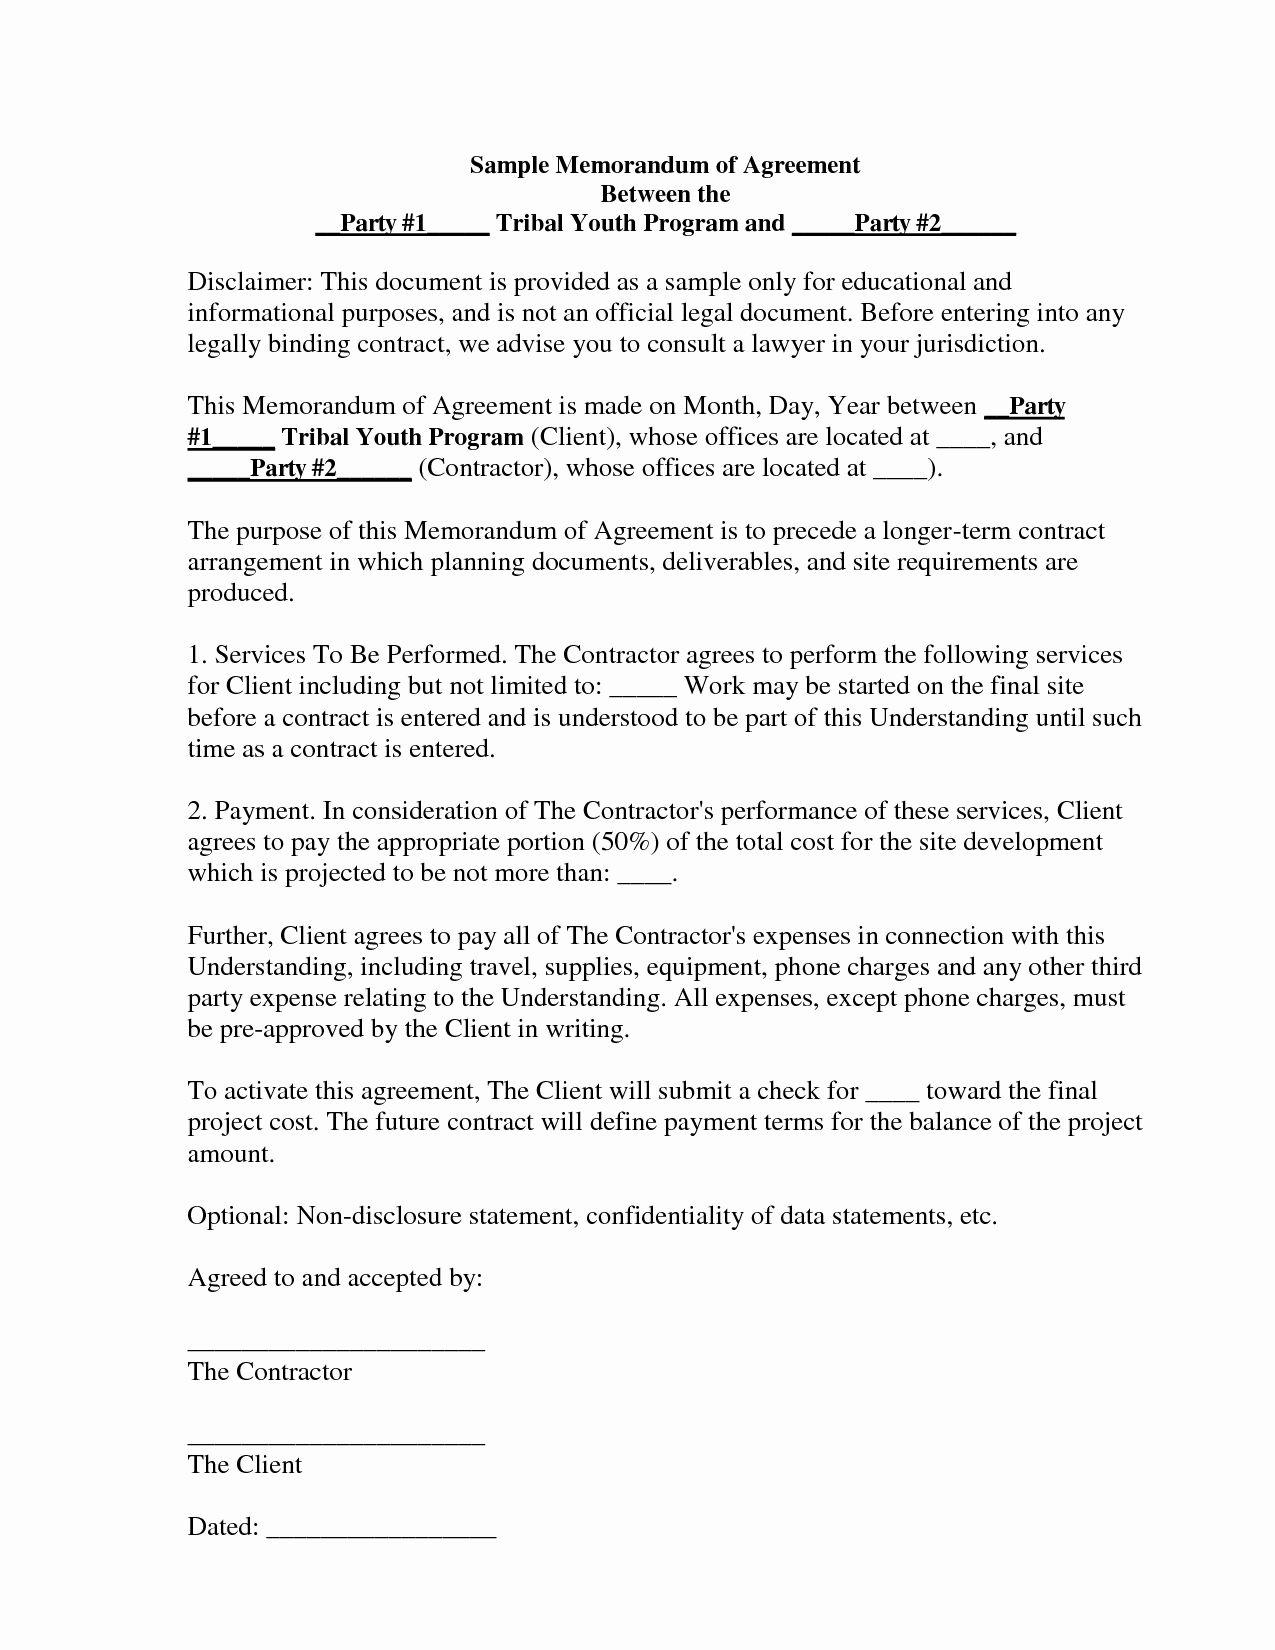 Memorandum Of Understanding Sample Elegant Best S Of Memorandum Agreement Sample Sample Memorandum Separation Agreement Template Agreement Quote Memorandum of understanding sample template